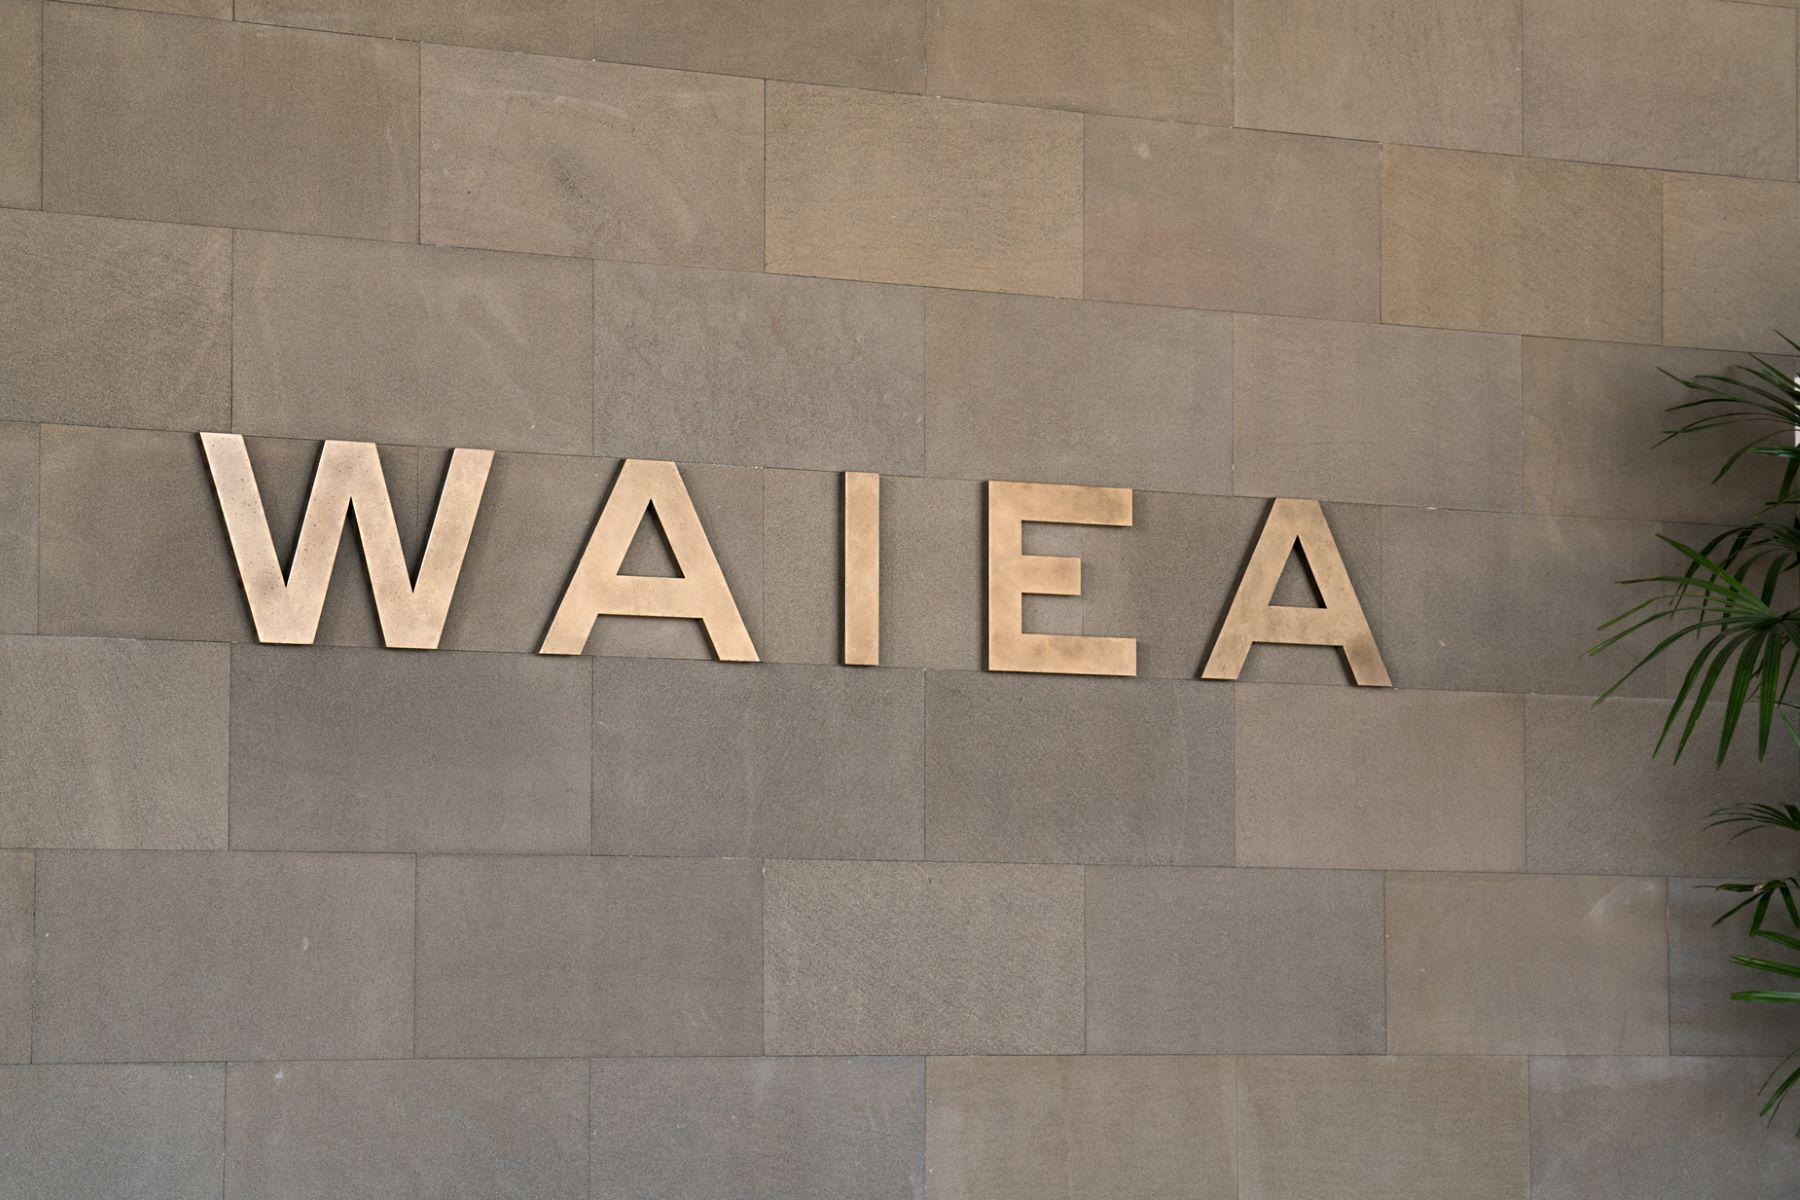 Additional photo for property listing at Majestic Waiea Grand Penthouse 1118 Ala Moana Boulevard #GPH 35 Honolulu, Hawaii 96814 United States